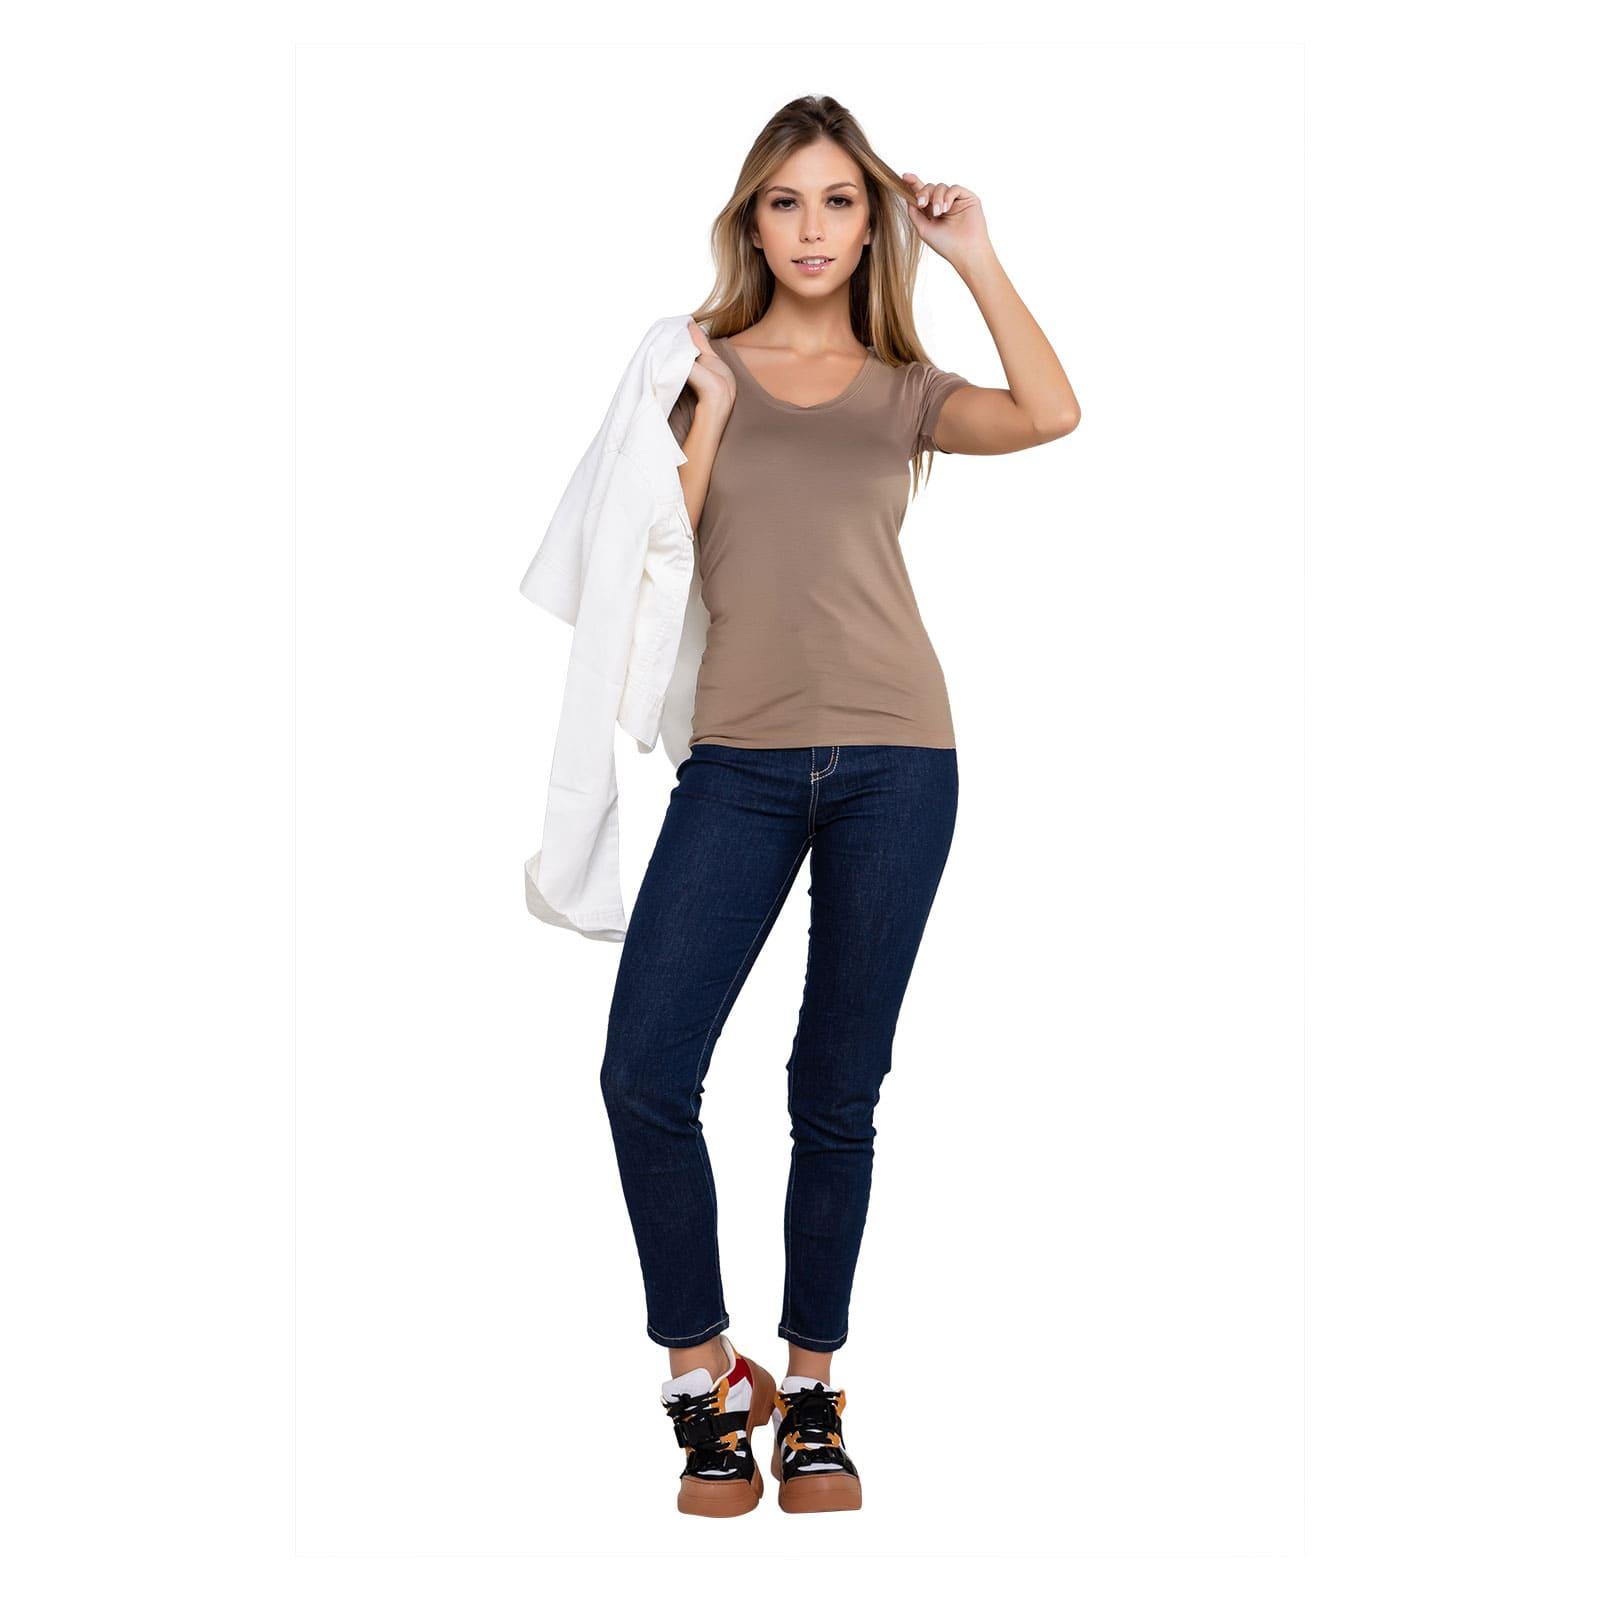 Calça Jeans Feminina Cintura Alta Cropped